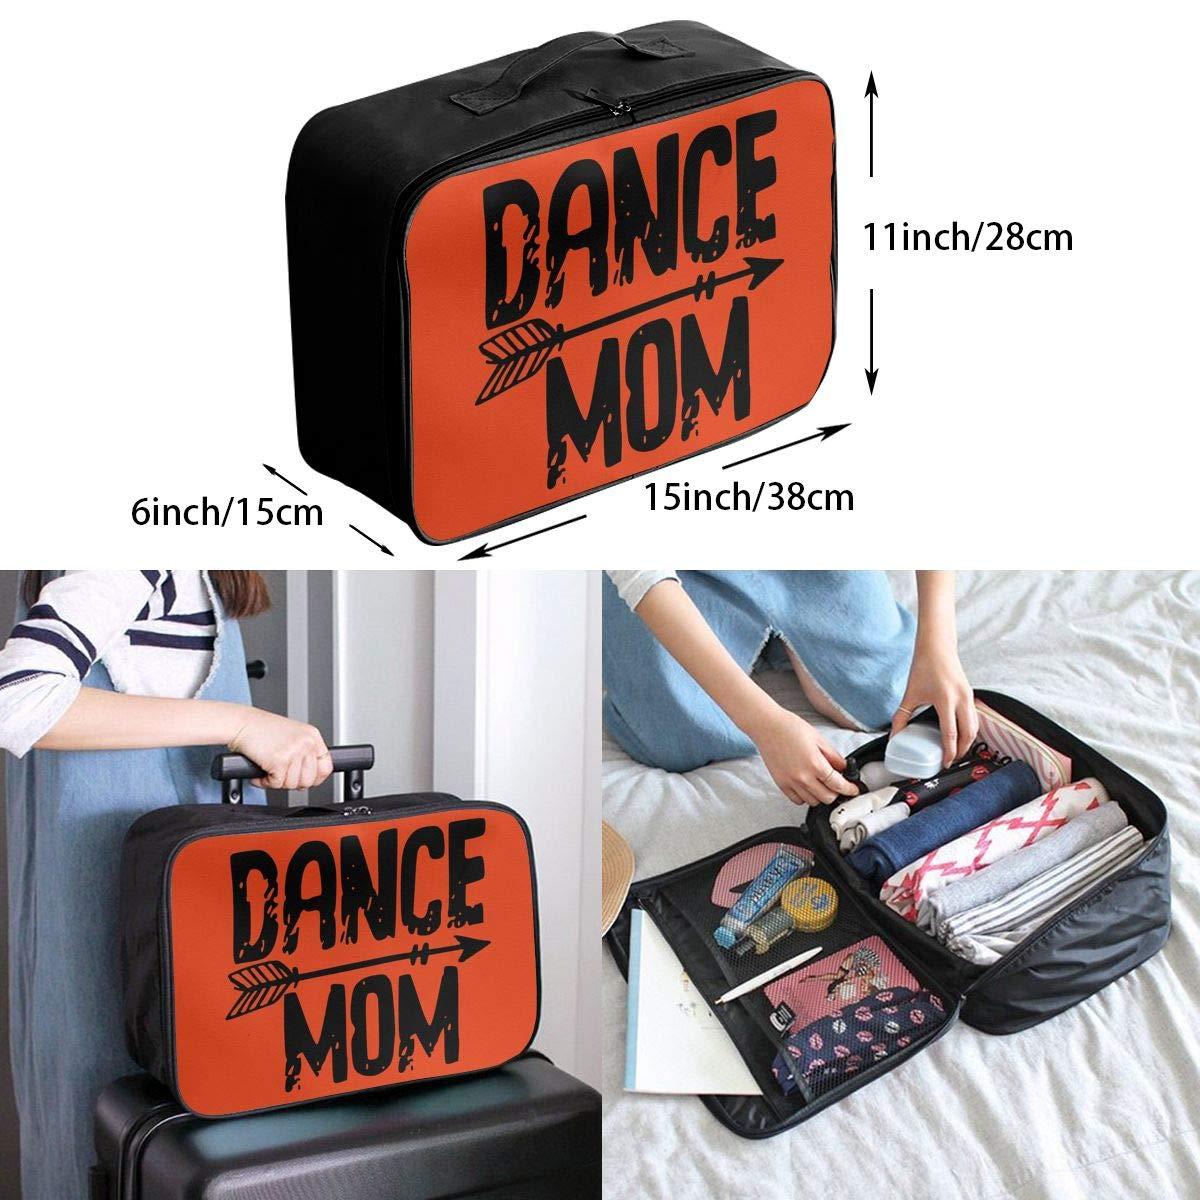 Travel Luggage Duffle Bag Lightweight Portable Handbag Dance Mom Large Capacity Waterproof Foldable Storage Tote